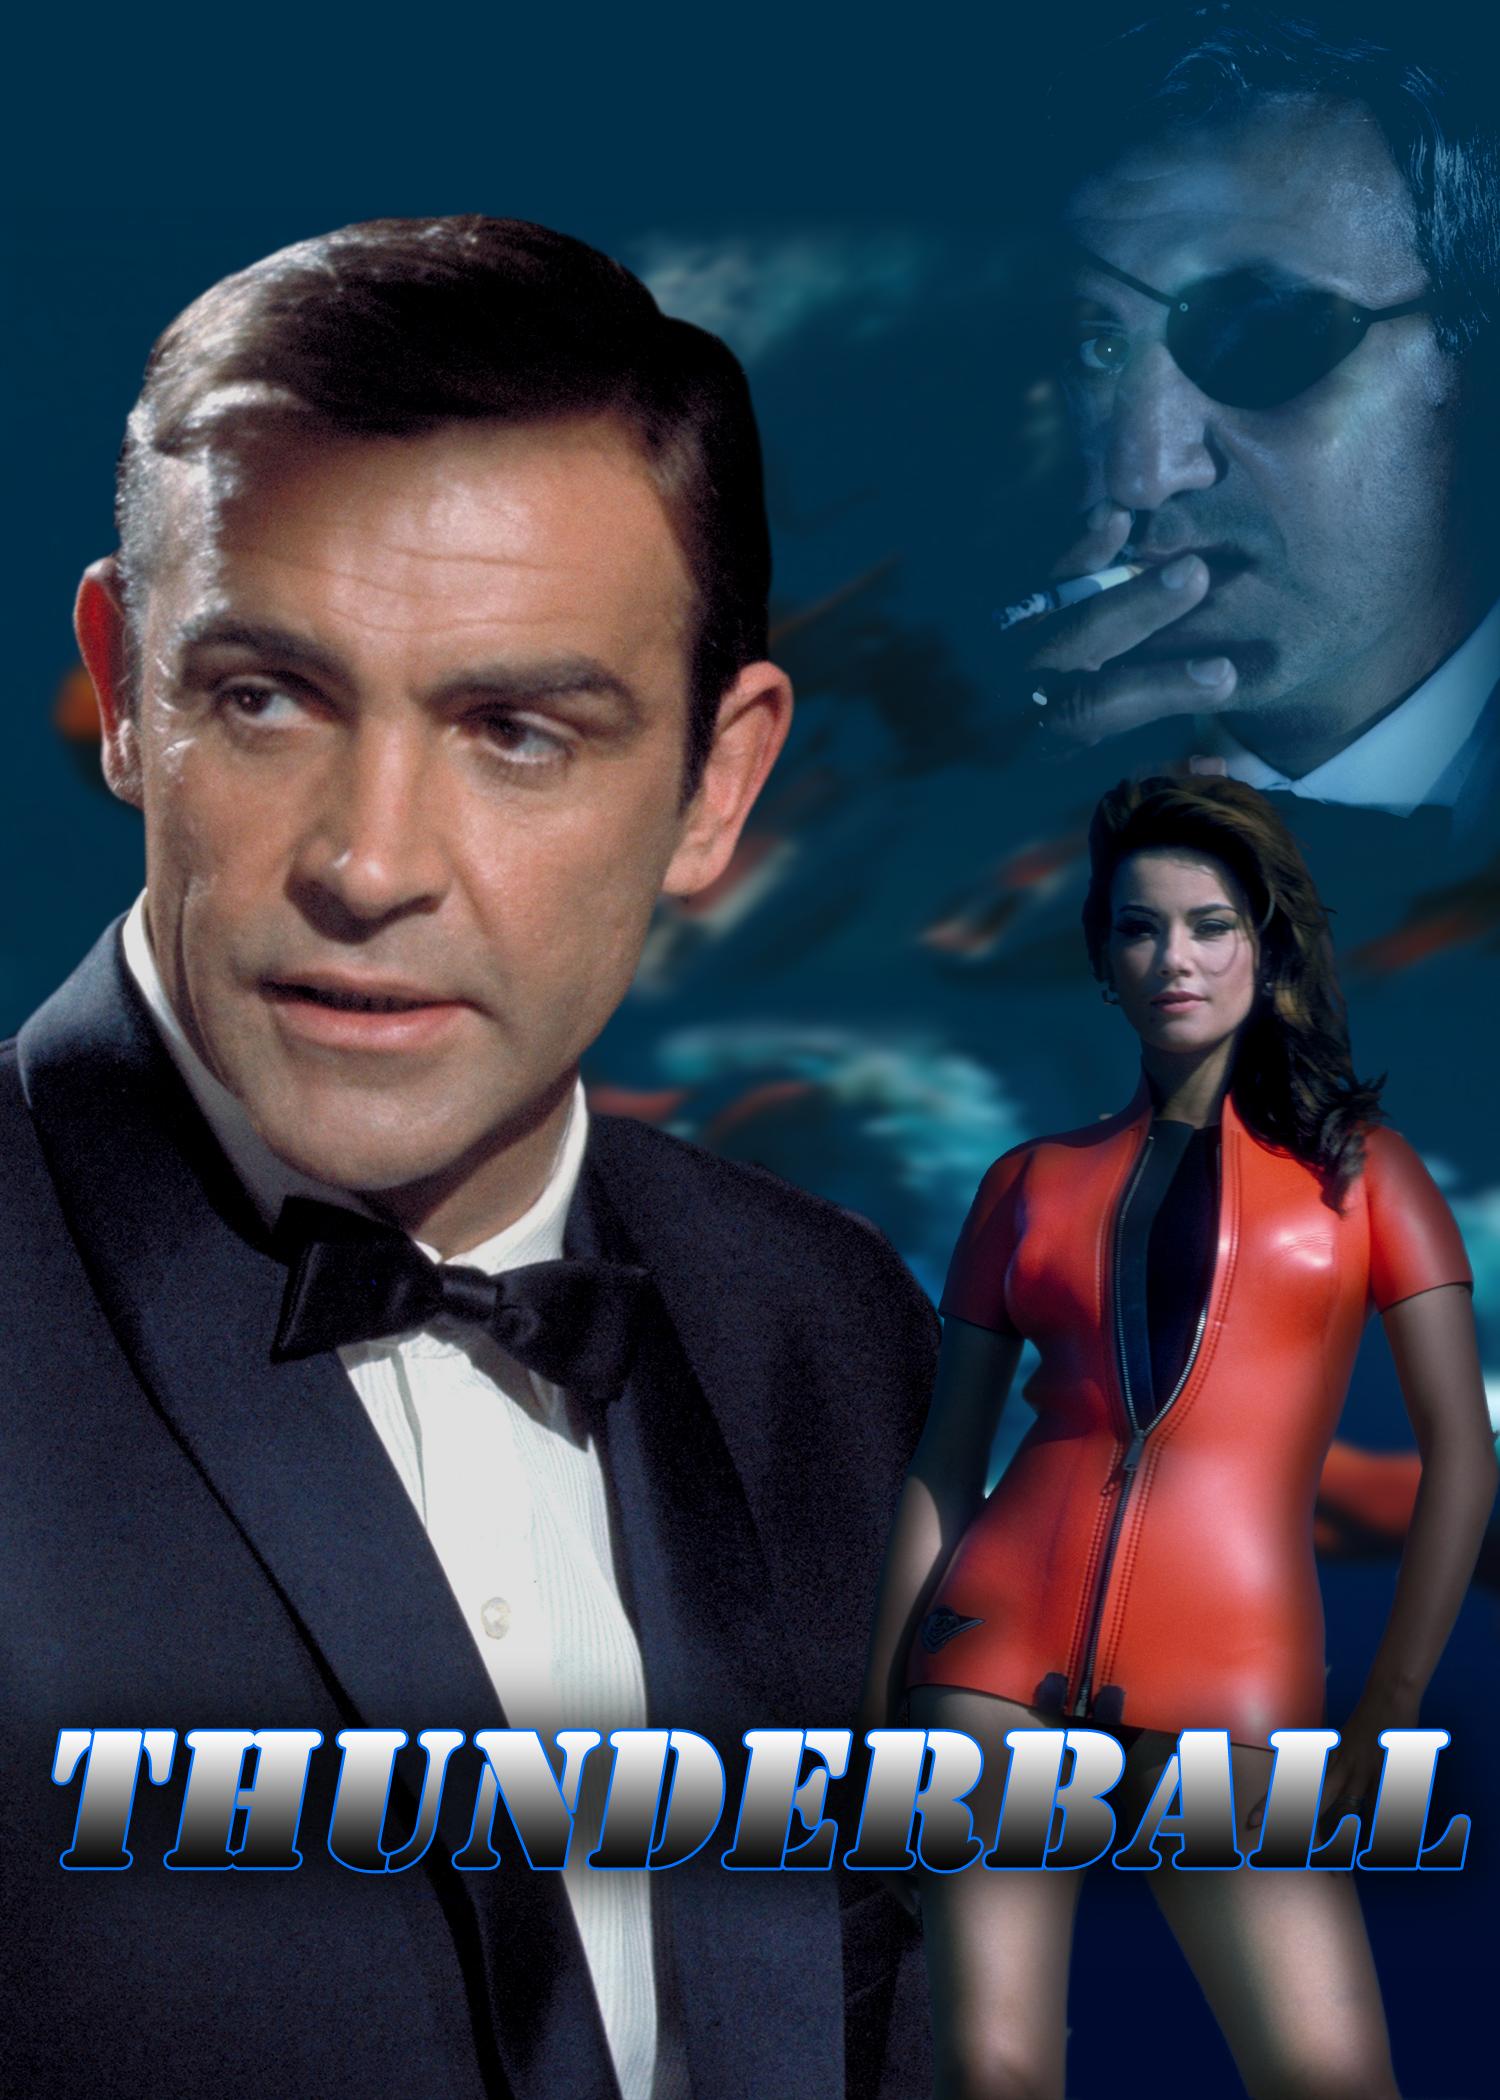 thunderball_poster_by_comandercool22-d689f2h.jpg